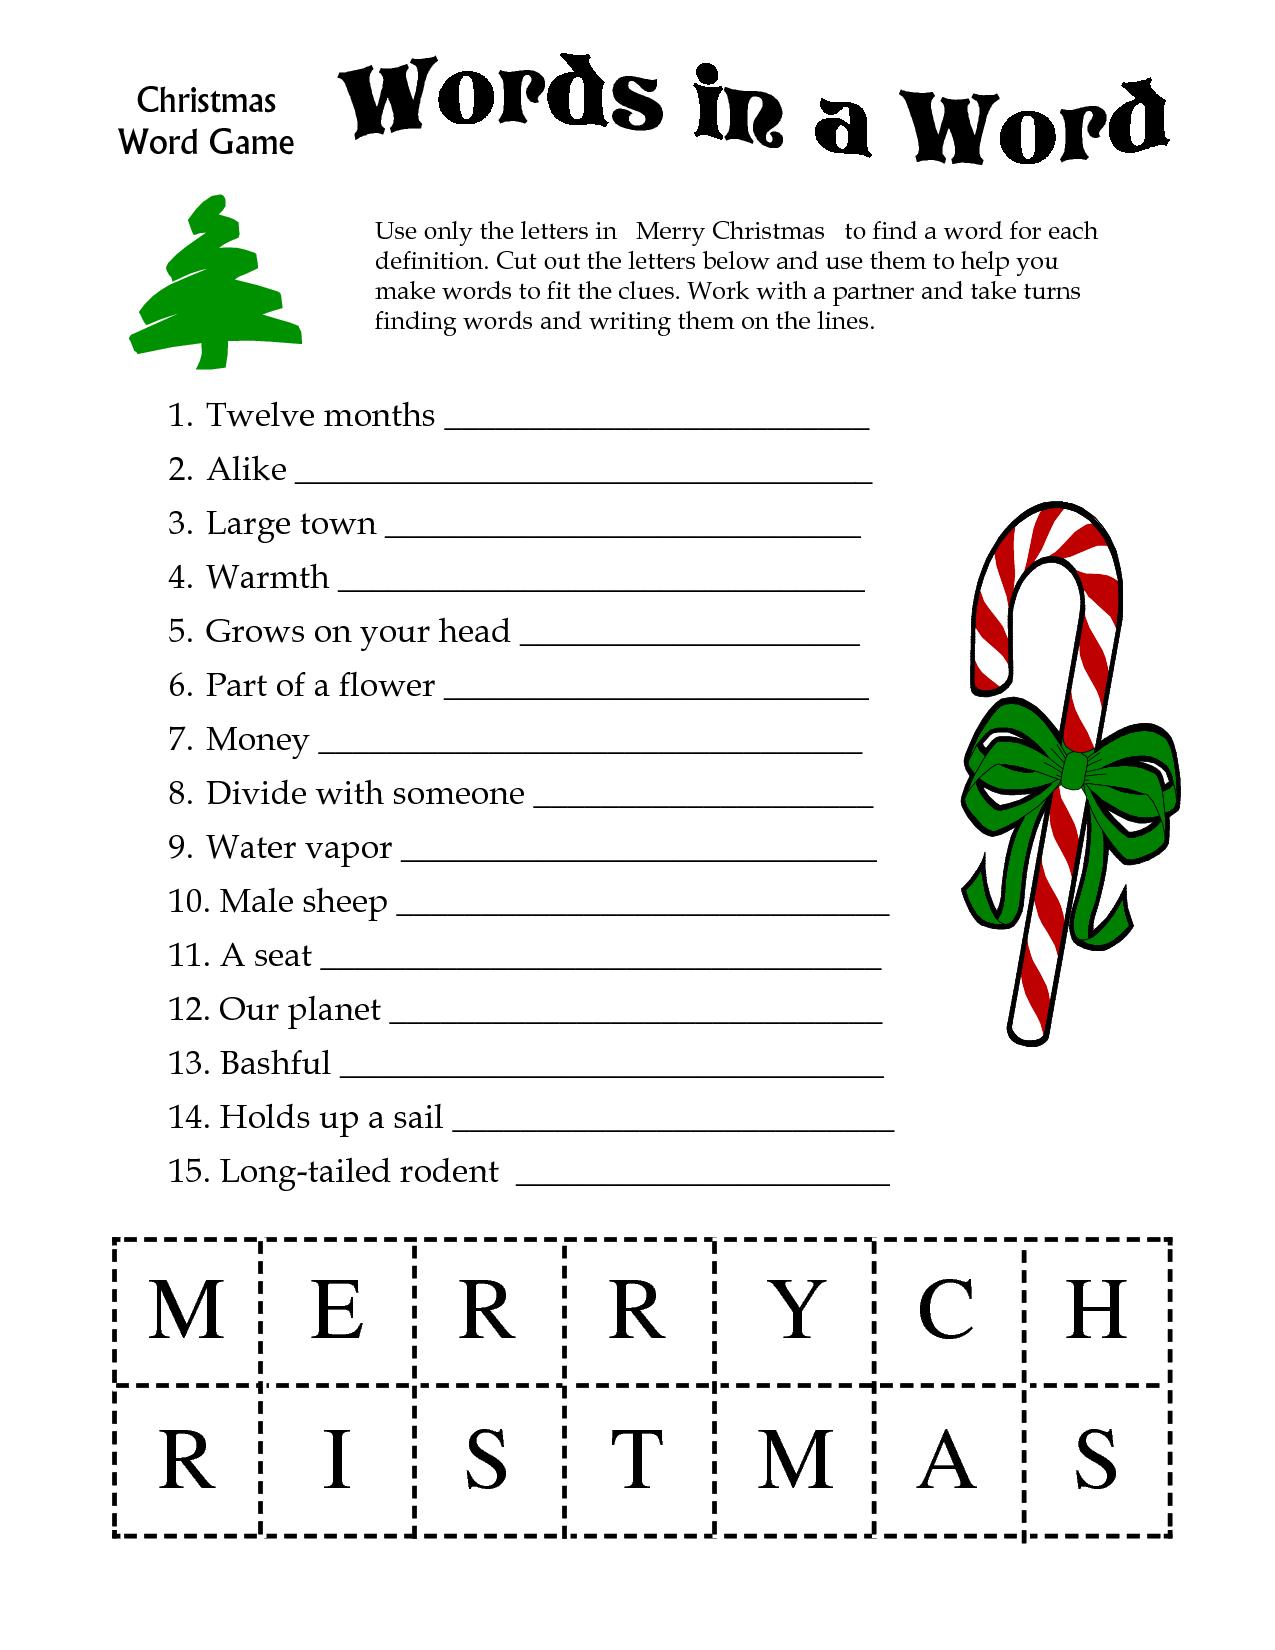 5 Images Of Free Printable Christmas Word Games | Printablee - Free Printable Christmas Word Games